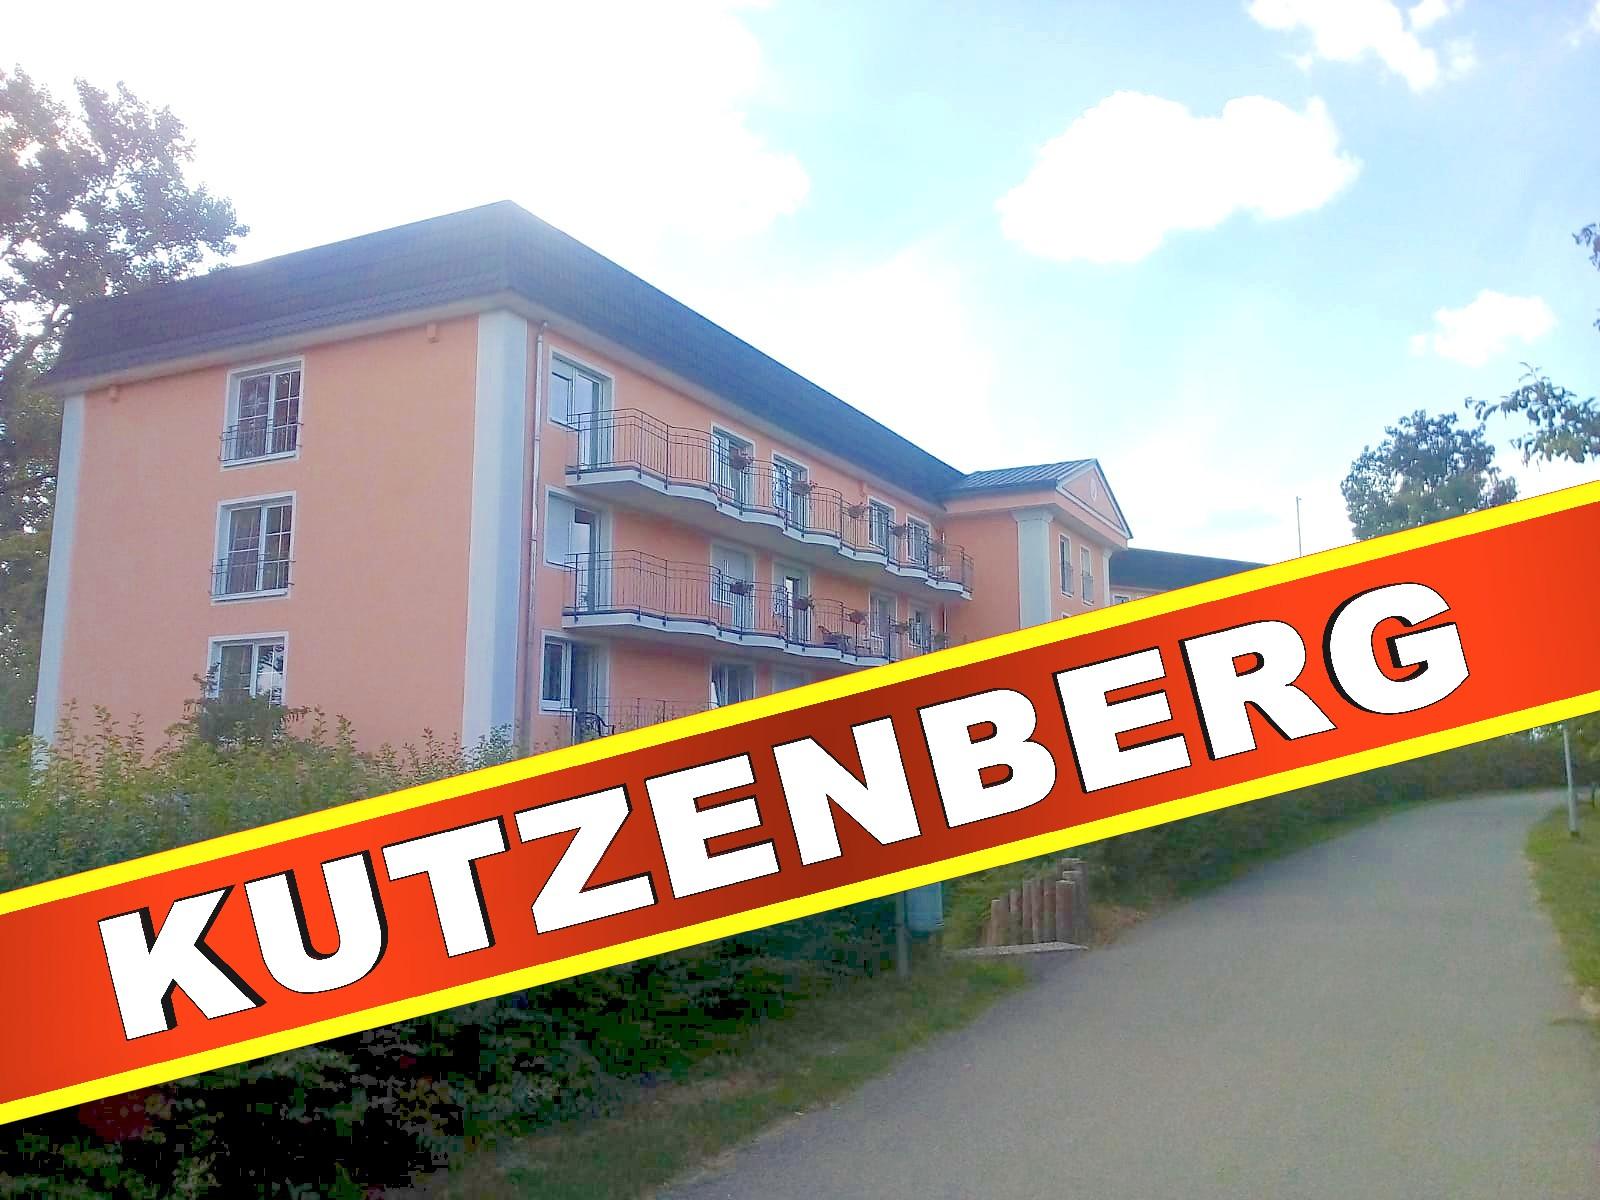 Bezirksklinikum Obermain Kutzenberg, 96250 Ebensfeld Psychiatrie Polizei Krankenhaus (40)